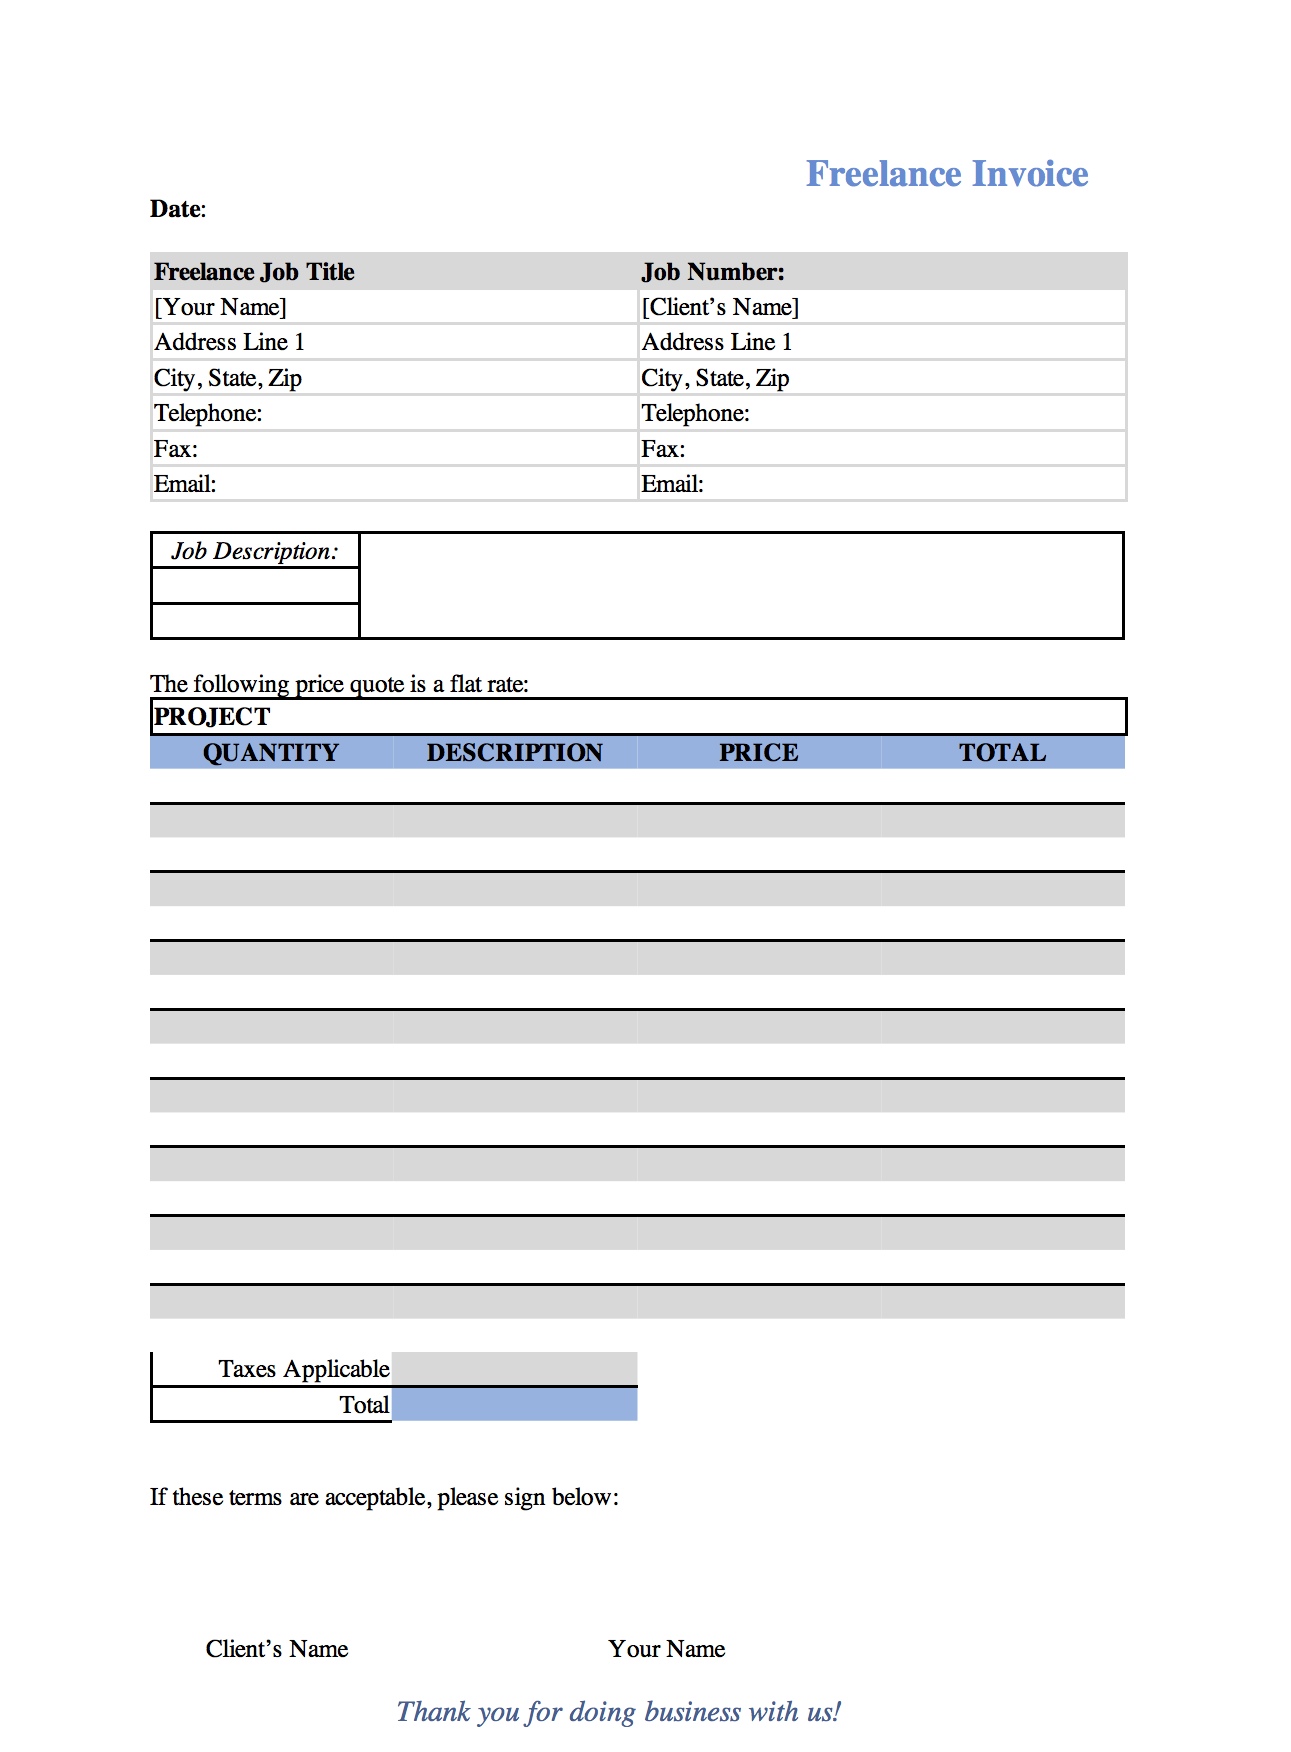 Receipt Template Word  Freelance Invoice Design Images  Freelance Invoice Template  Star Tsp100 Tsp143u Usb Receipt Printer Excel with Cash Receipts And Disbursements Freelance Invoice Template Avis Rental Car Receipt Excel